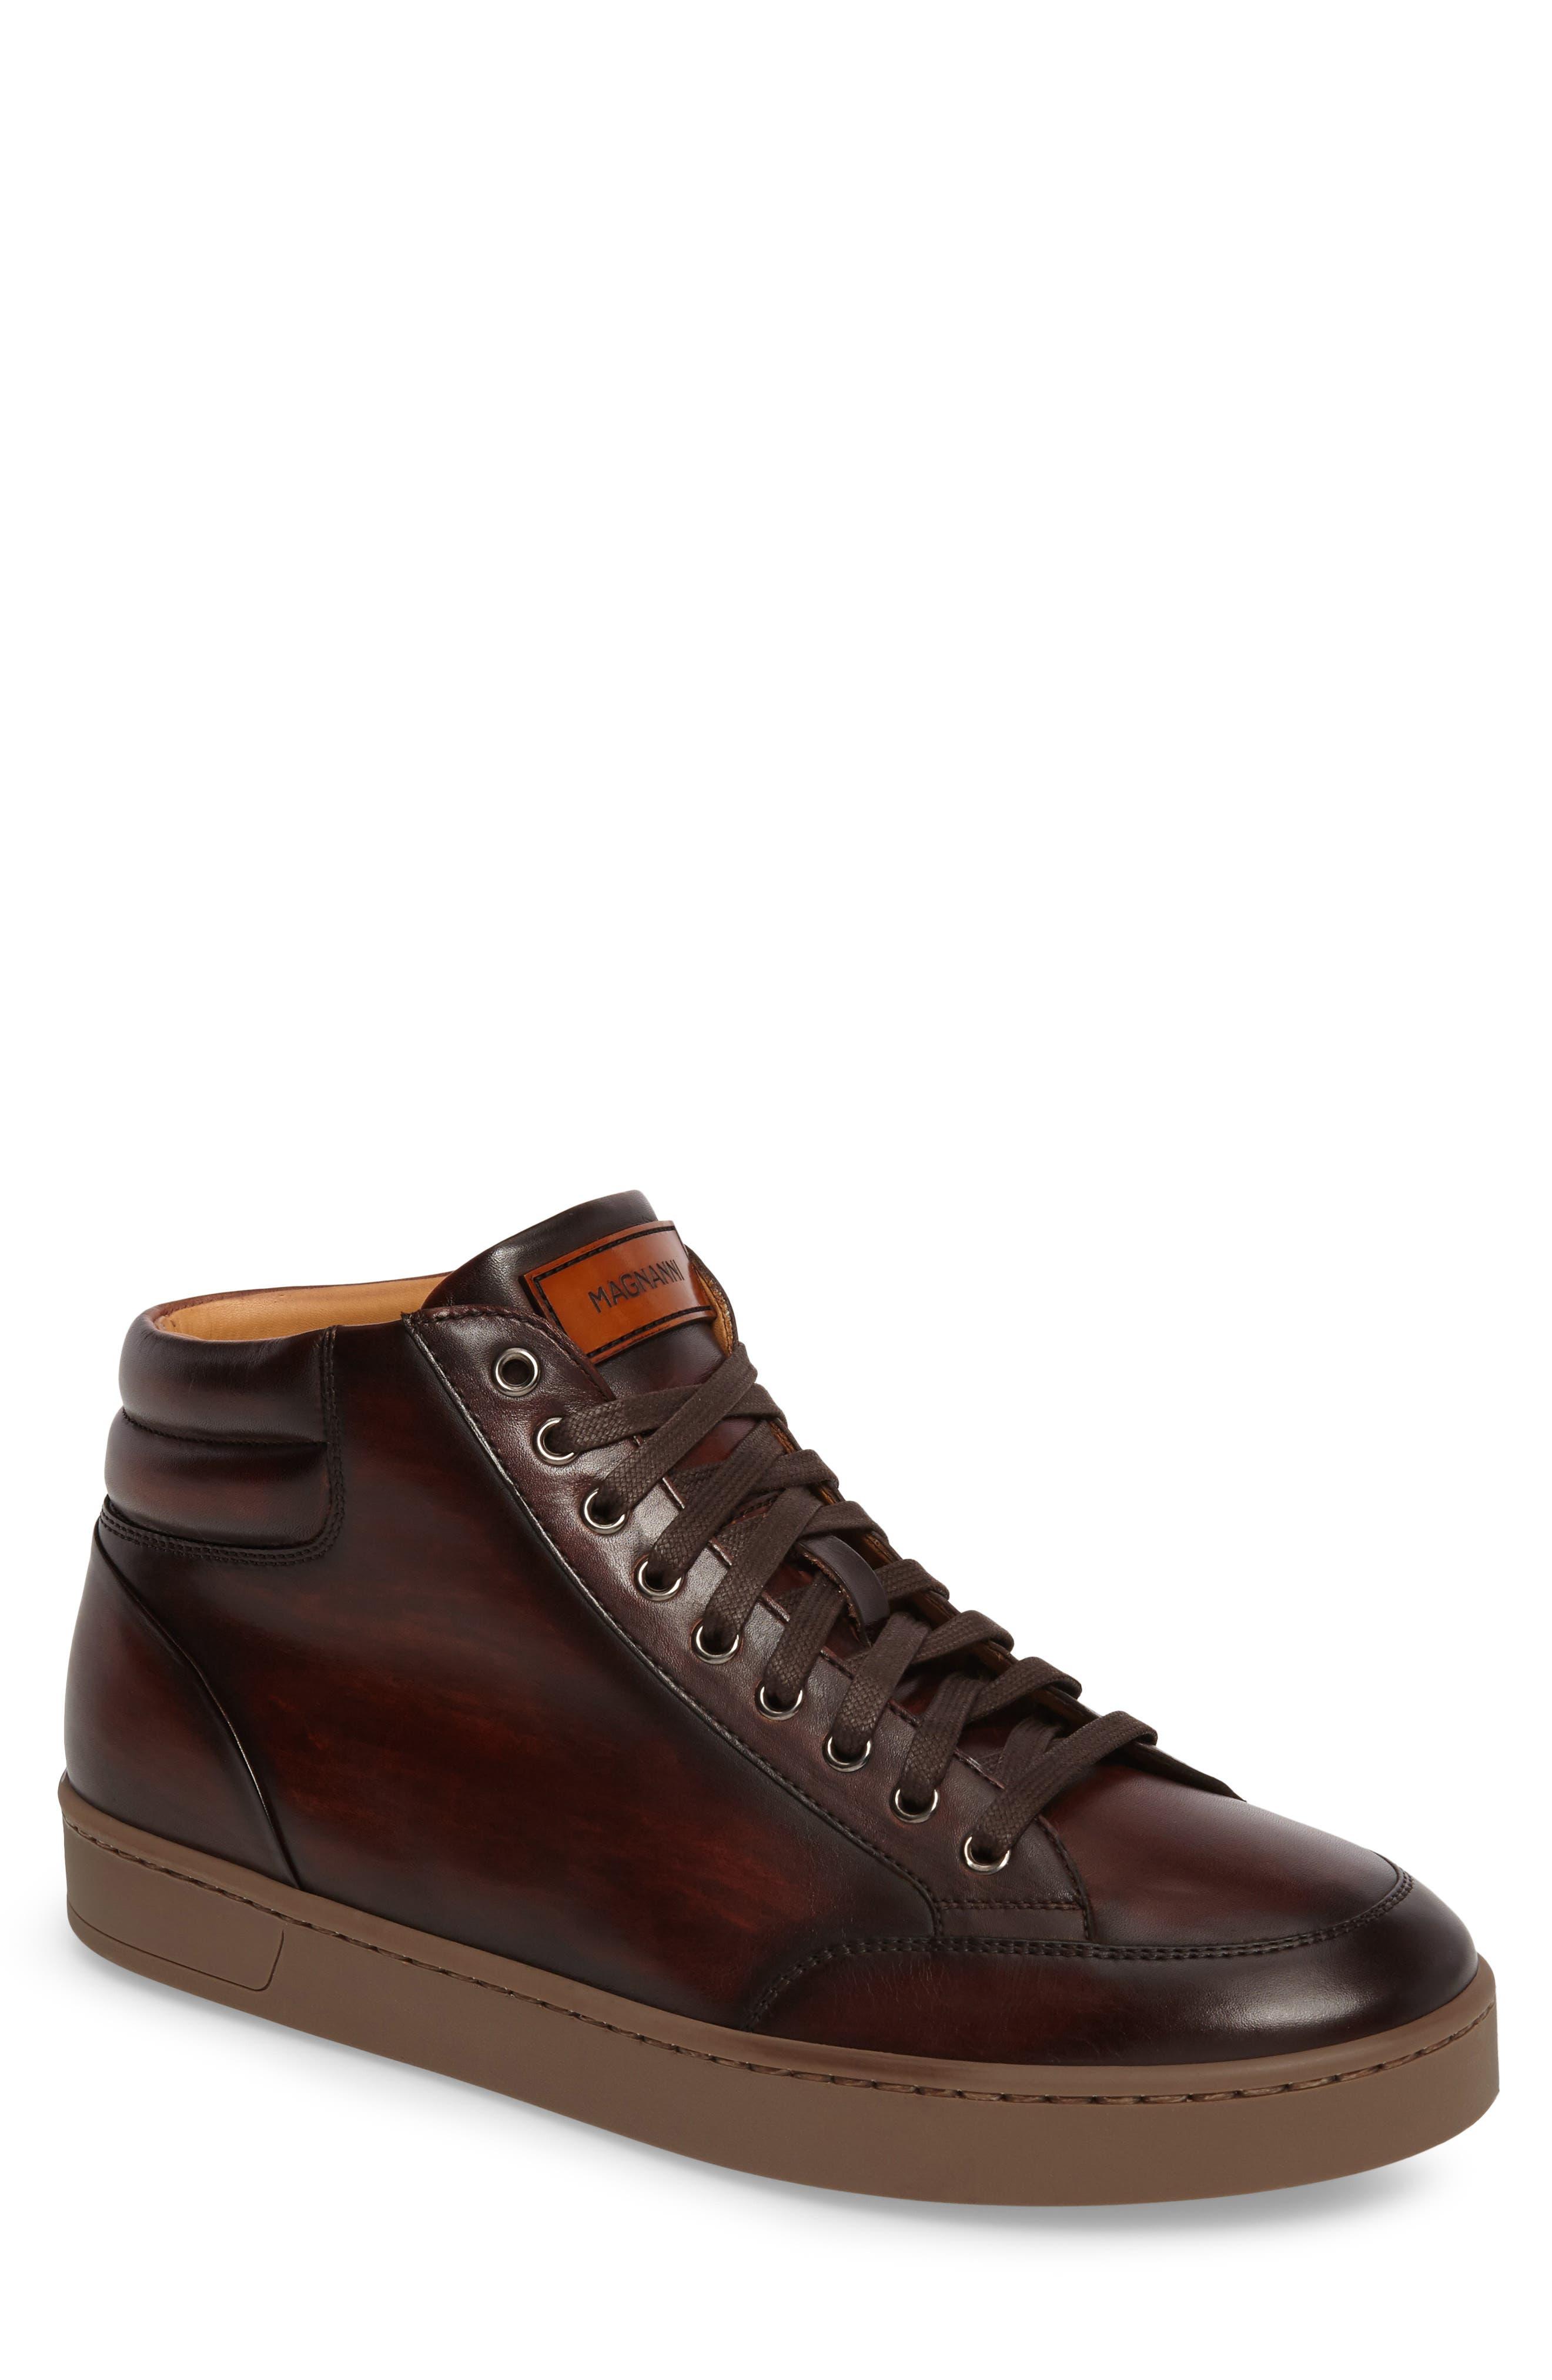 Magnanni Men's Carmel Sneaker zR96ufFk